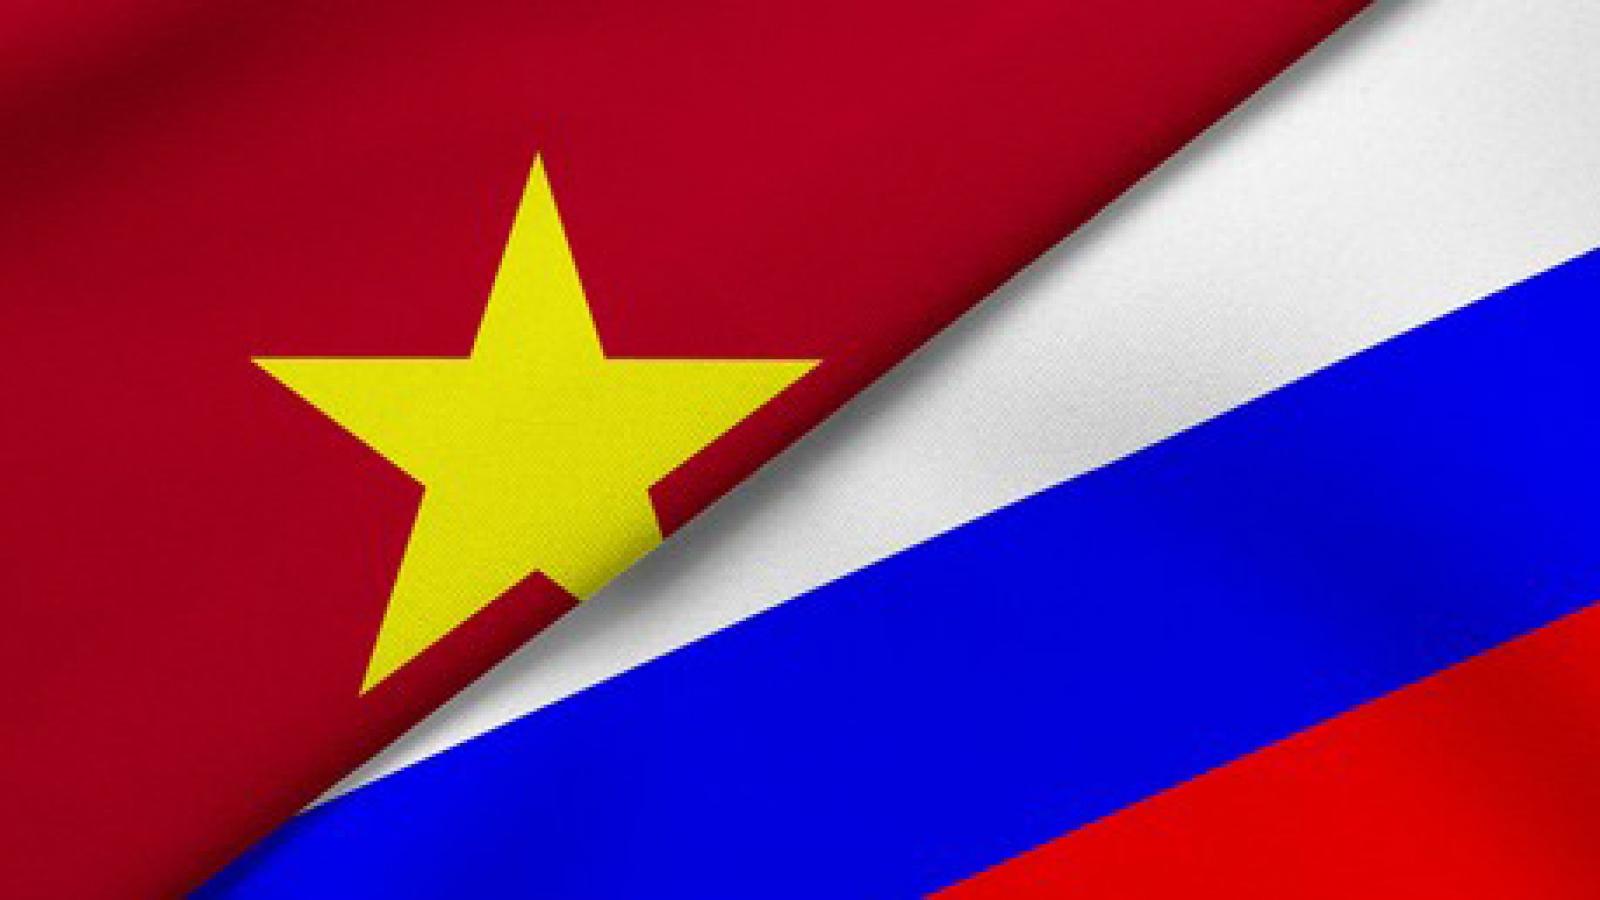 Vietnam, Russia to hold phone talks on strategic partnership on Sept 16